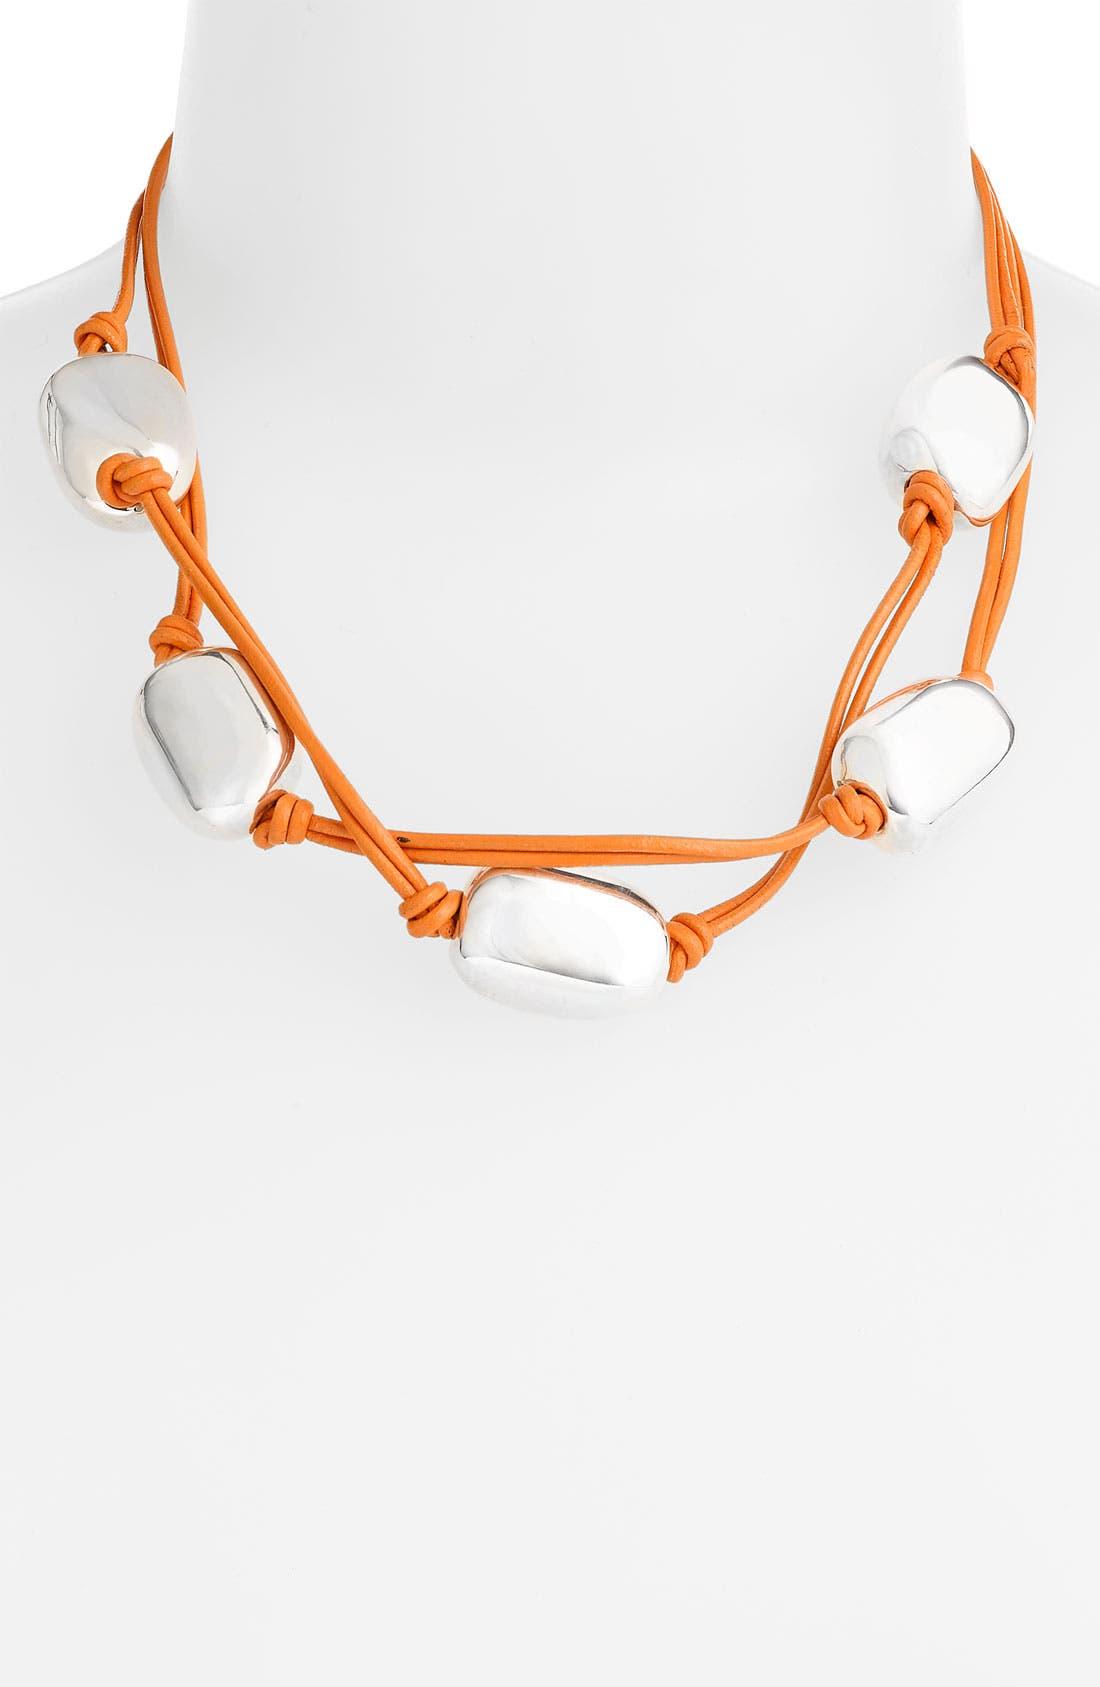 Main Image - Simon Sebbag 5-Bead Leather Necklace